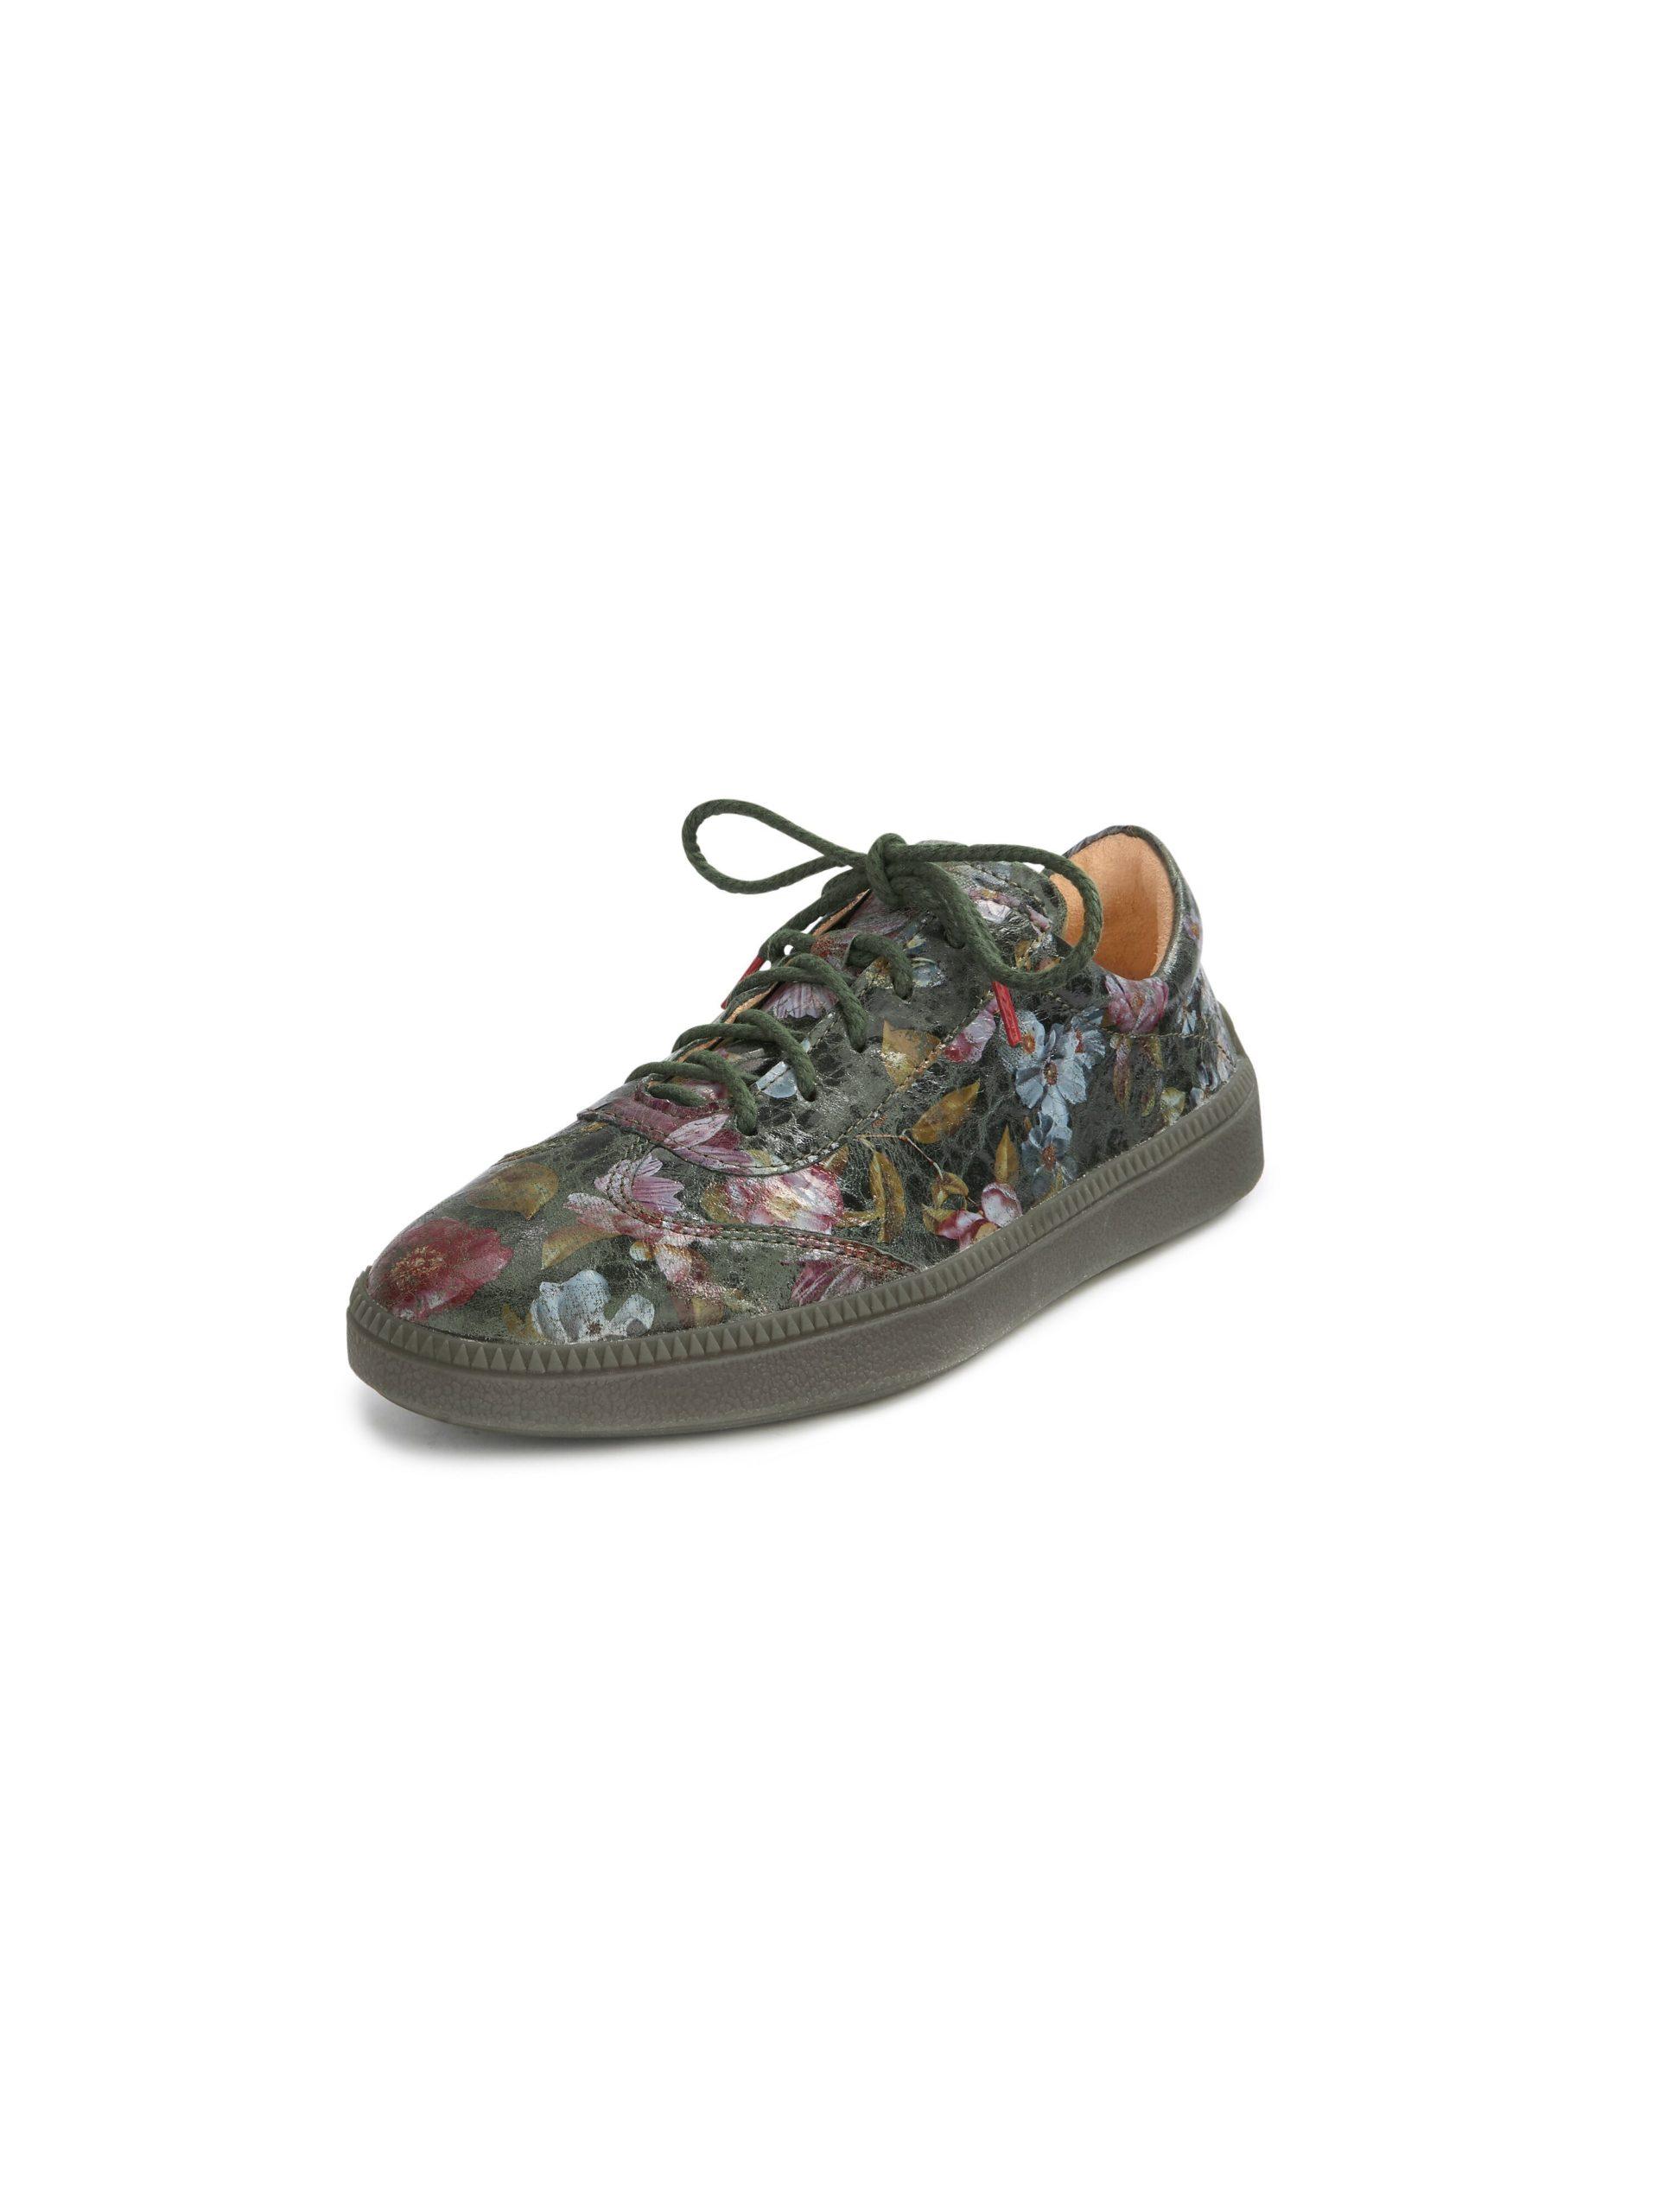 Sneakers model Turna Van Think! multicolour Kopen